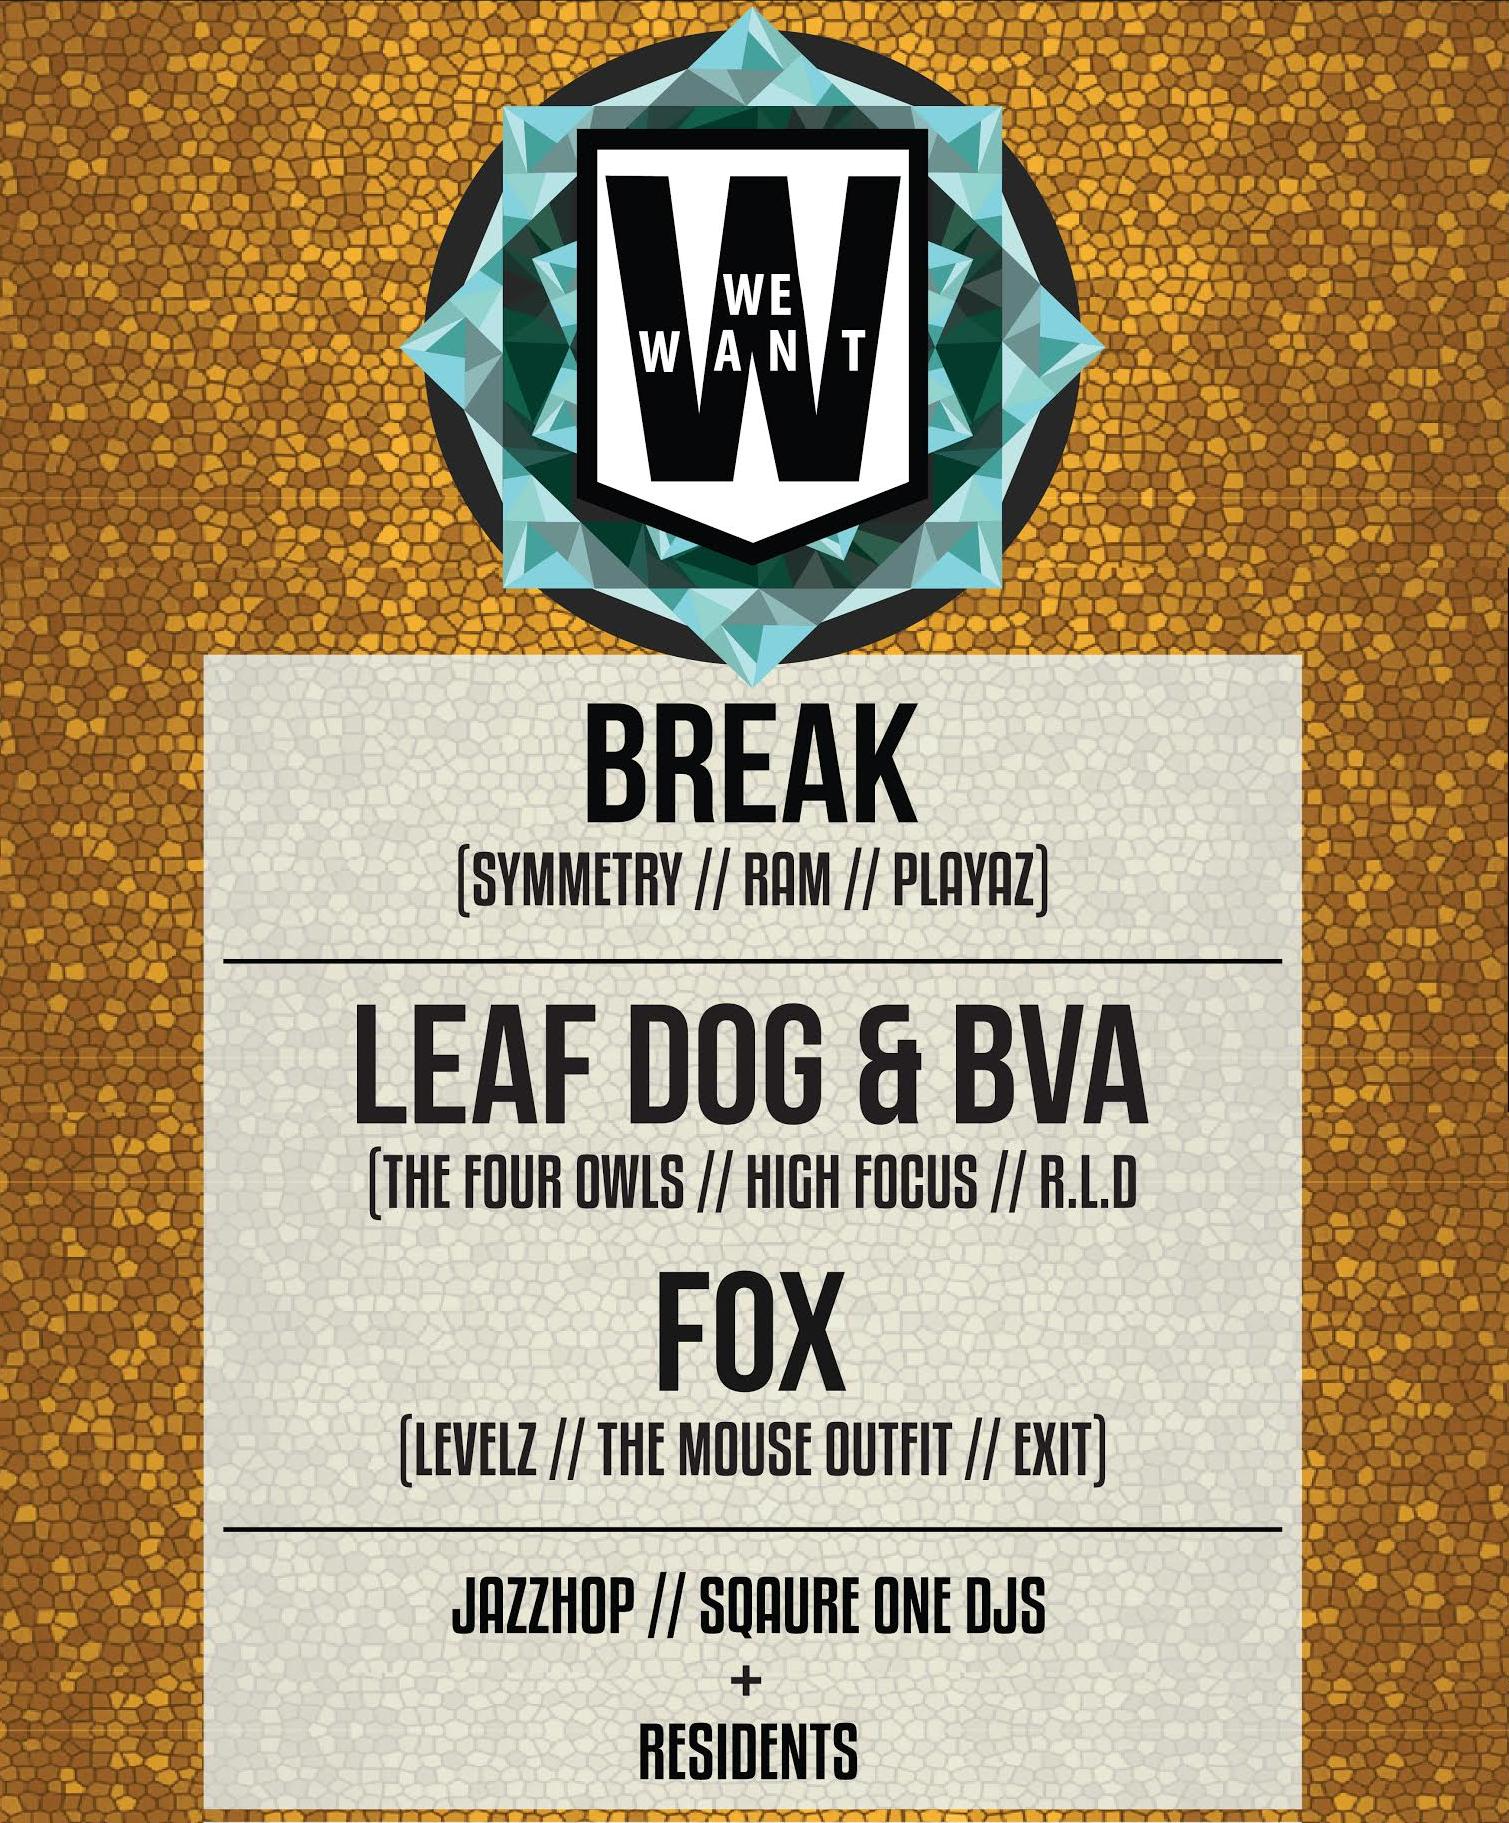 Leaf Dog & BVA Manchester